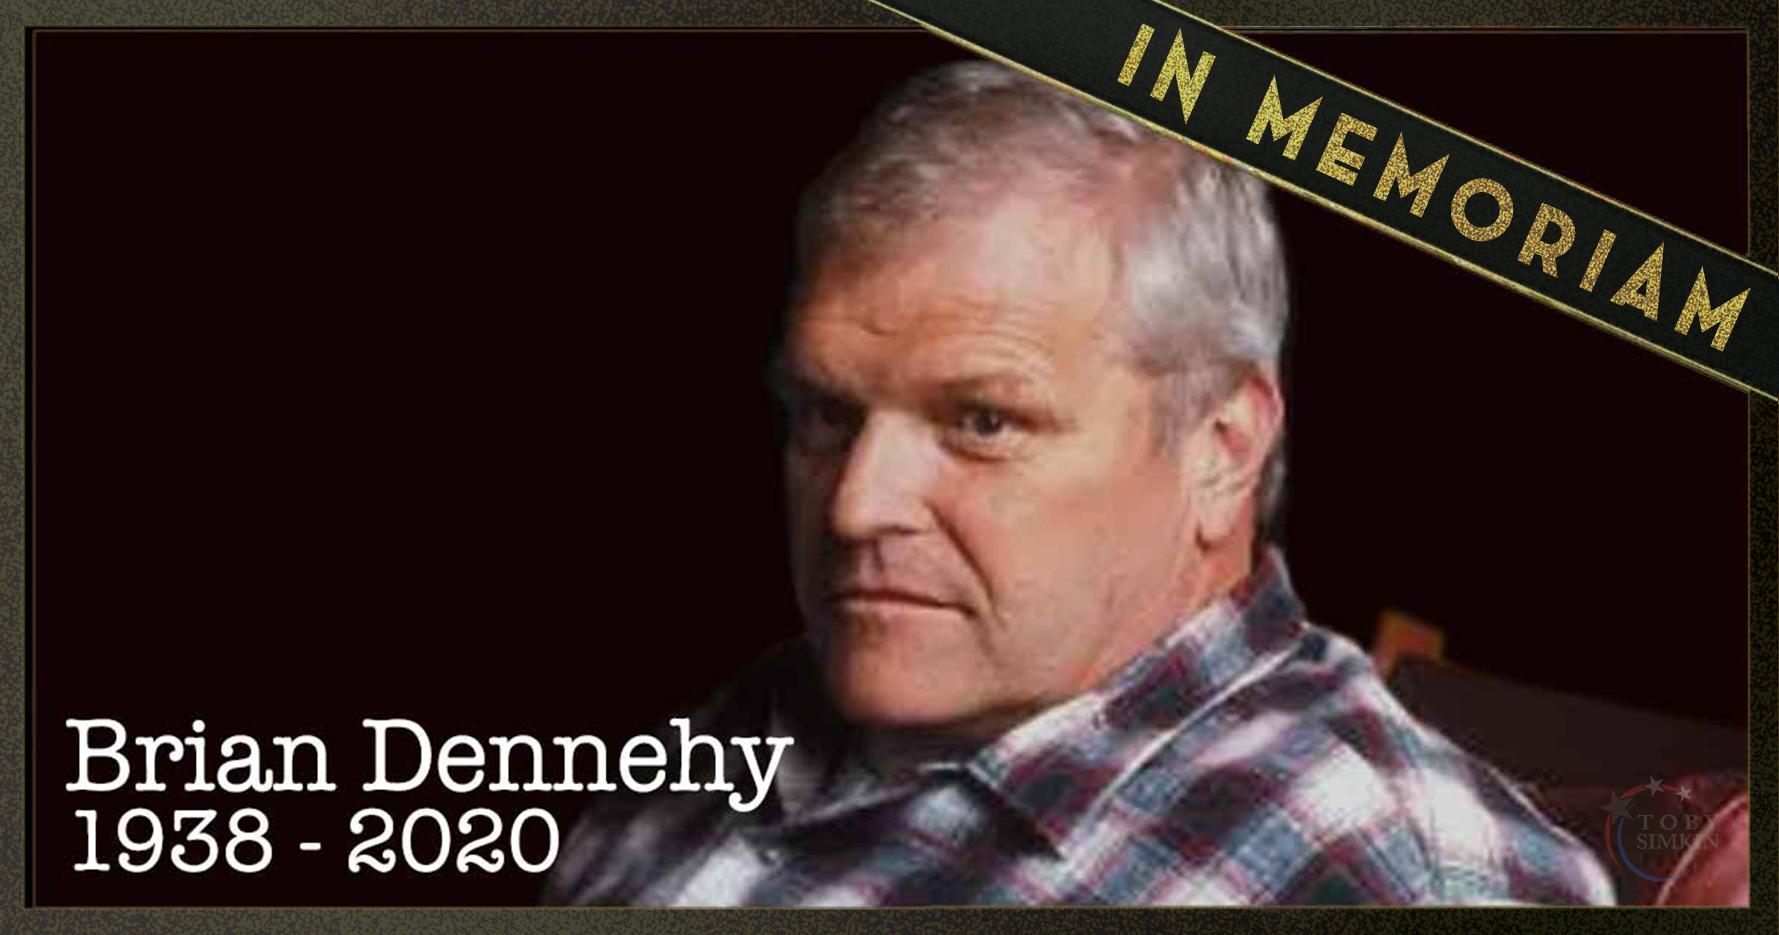 Brian Dennehy Memorium